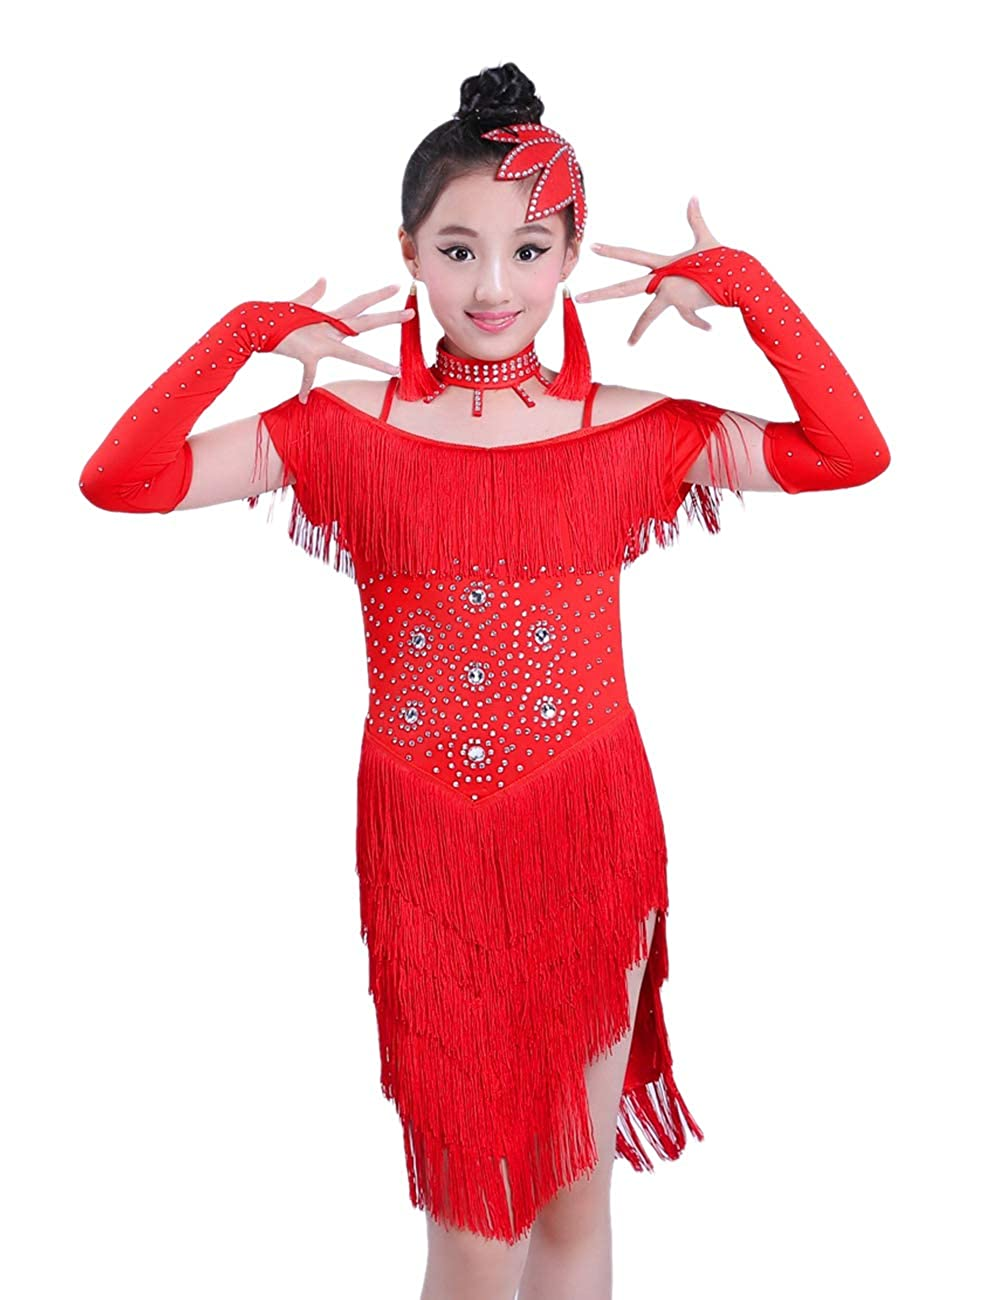 Zhhlinyuan Tassel Sequins Latin Dress - Kids Girls Dancer Competition Dresses